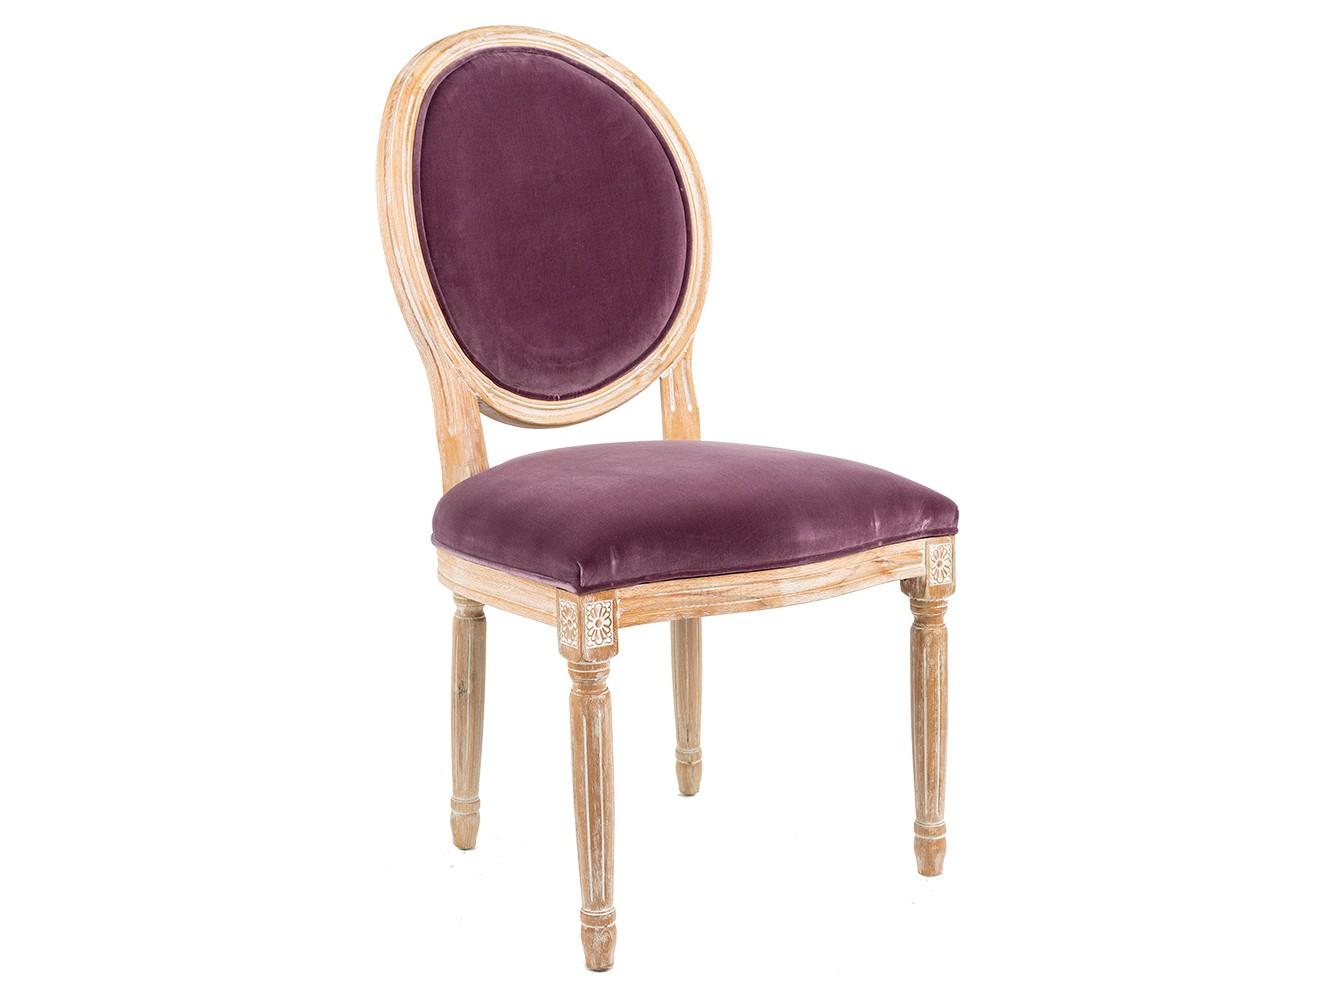 Кухонный стул Object Desire 15438335 от thefurnish